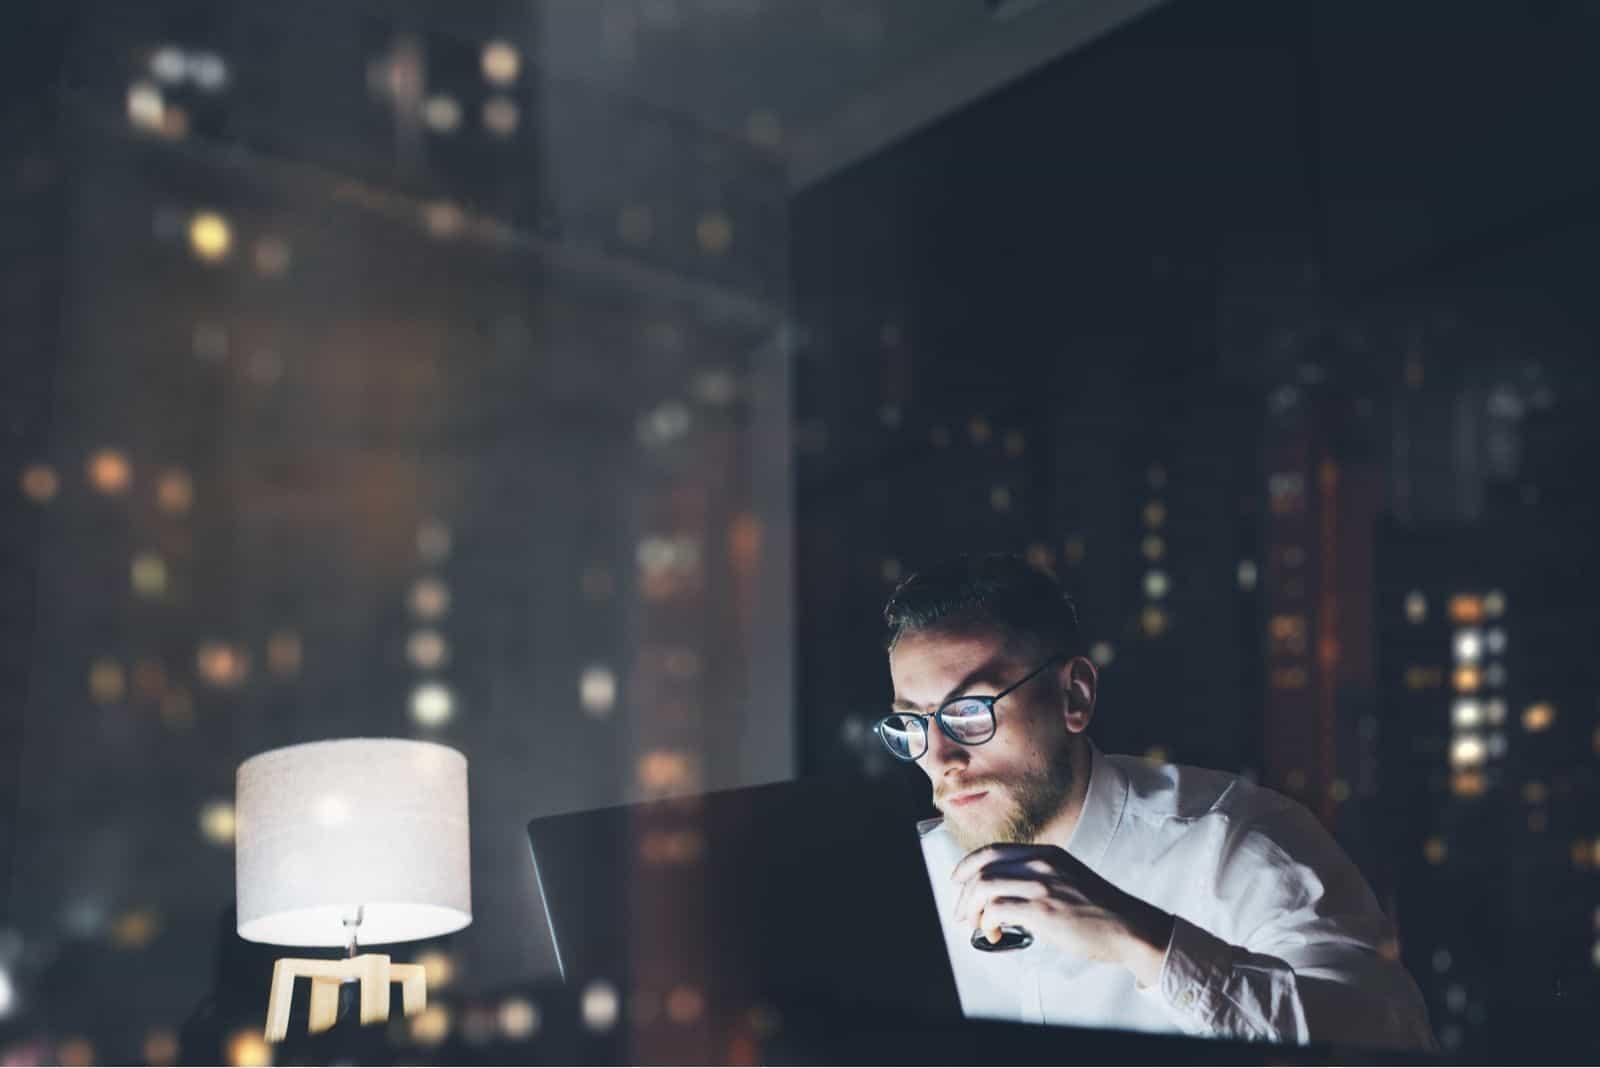 Bärtiger junger Geschäftsmann, der nachts an einem modernen Loft-Büro arbeitet